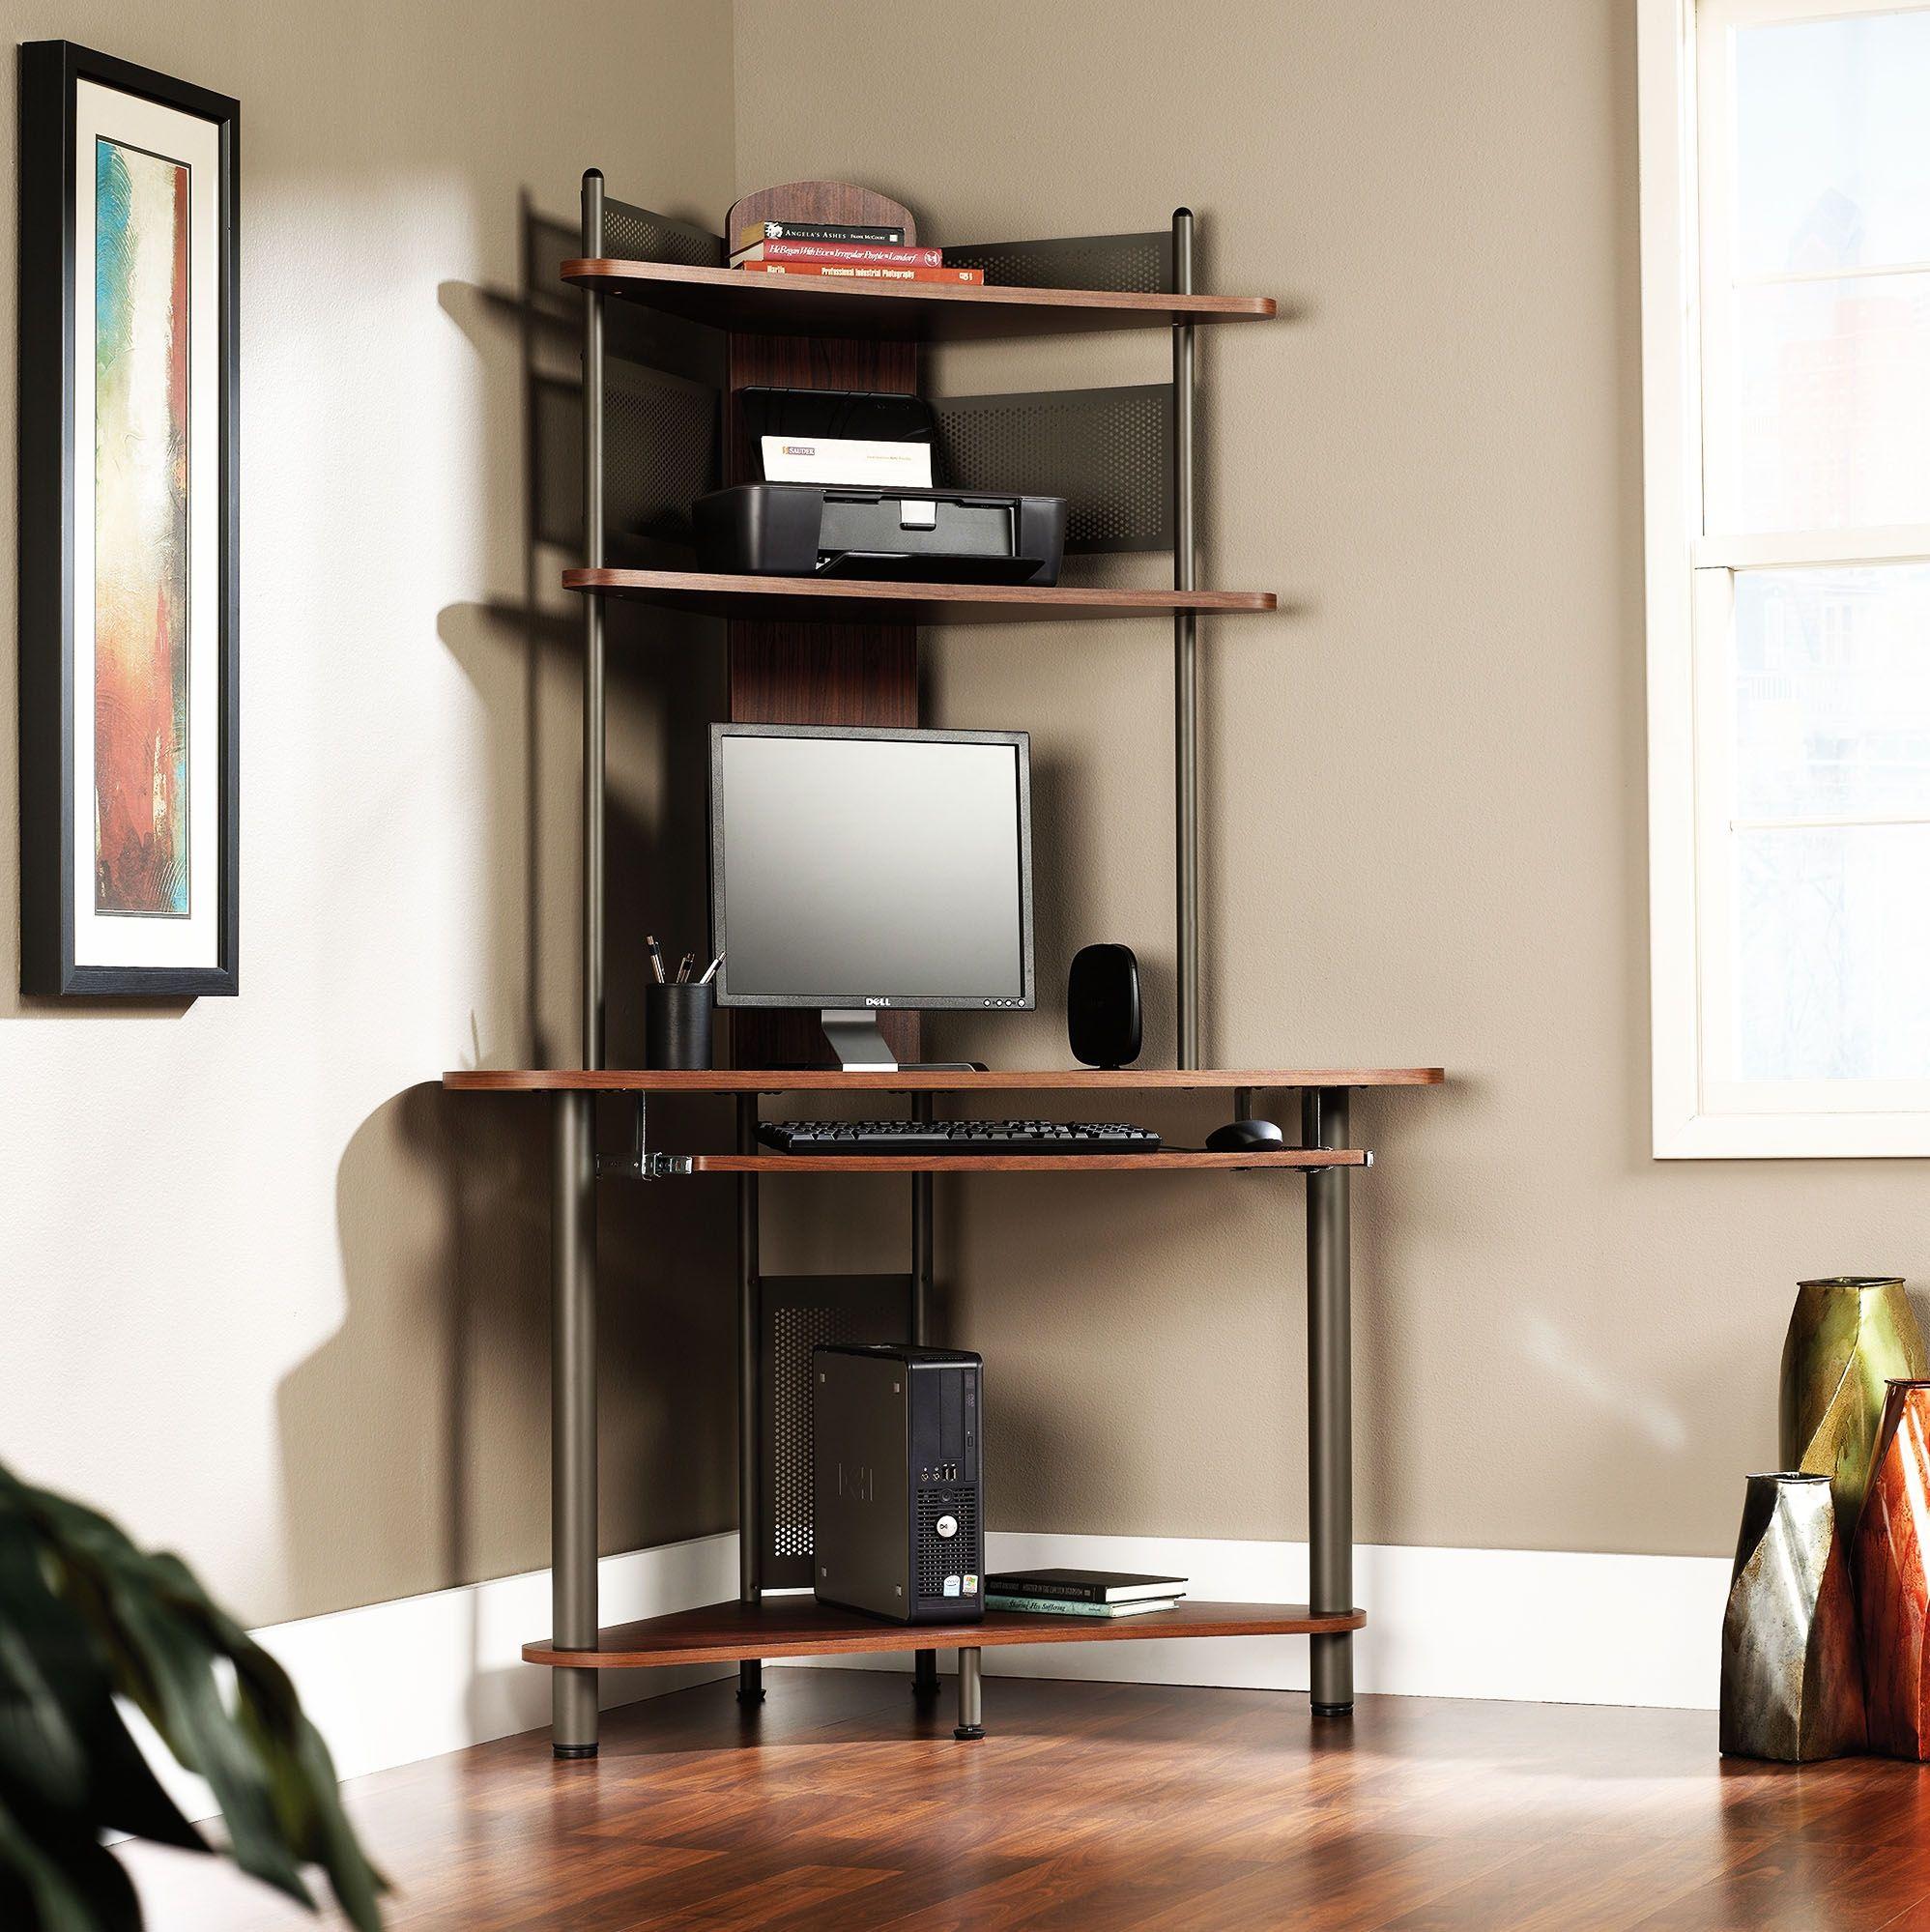 99 Corner Computer Desk With Printer Shelf Home Office Furniture Sets Check More At